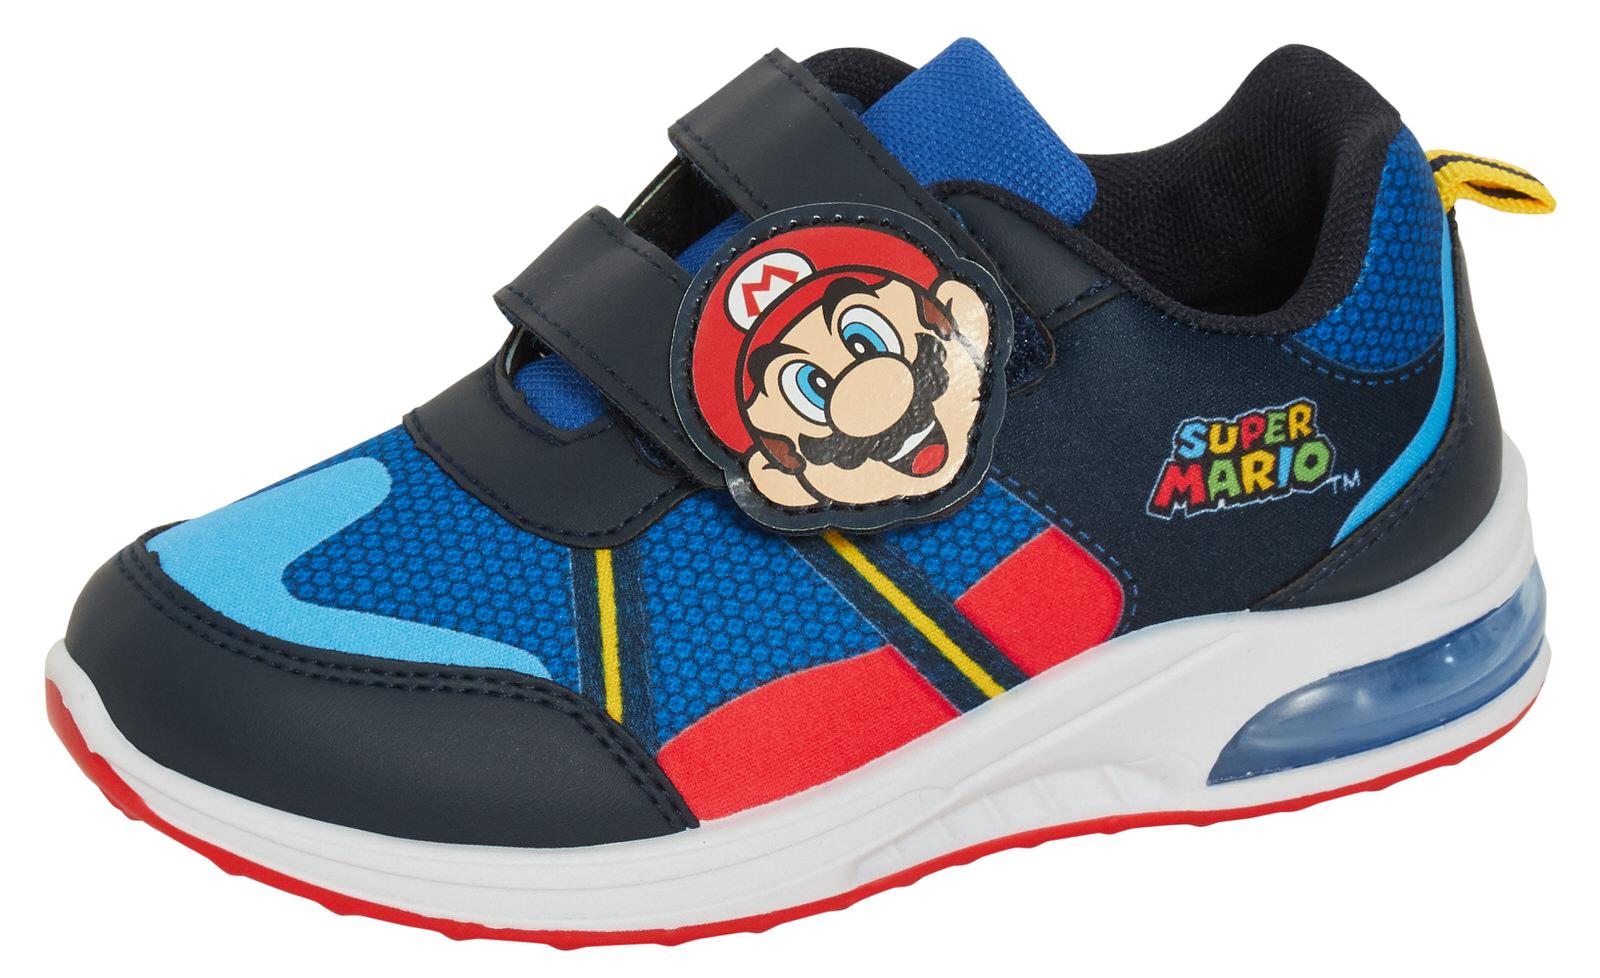 miniatuur 3 - Boys Super Mario Brothers Light Up Trainers Kids Nintendo Flashing Lights Shoes